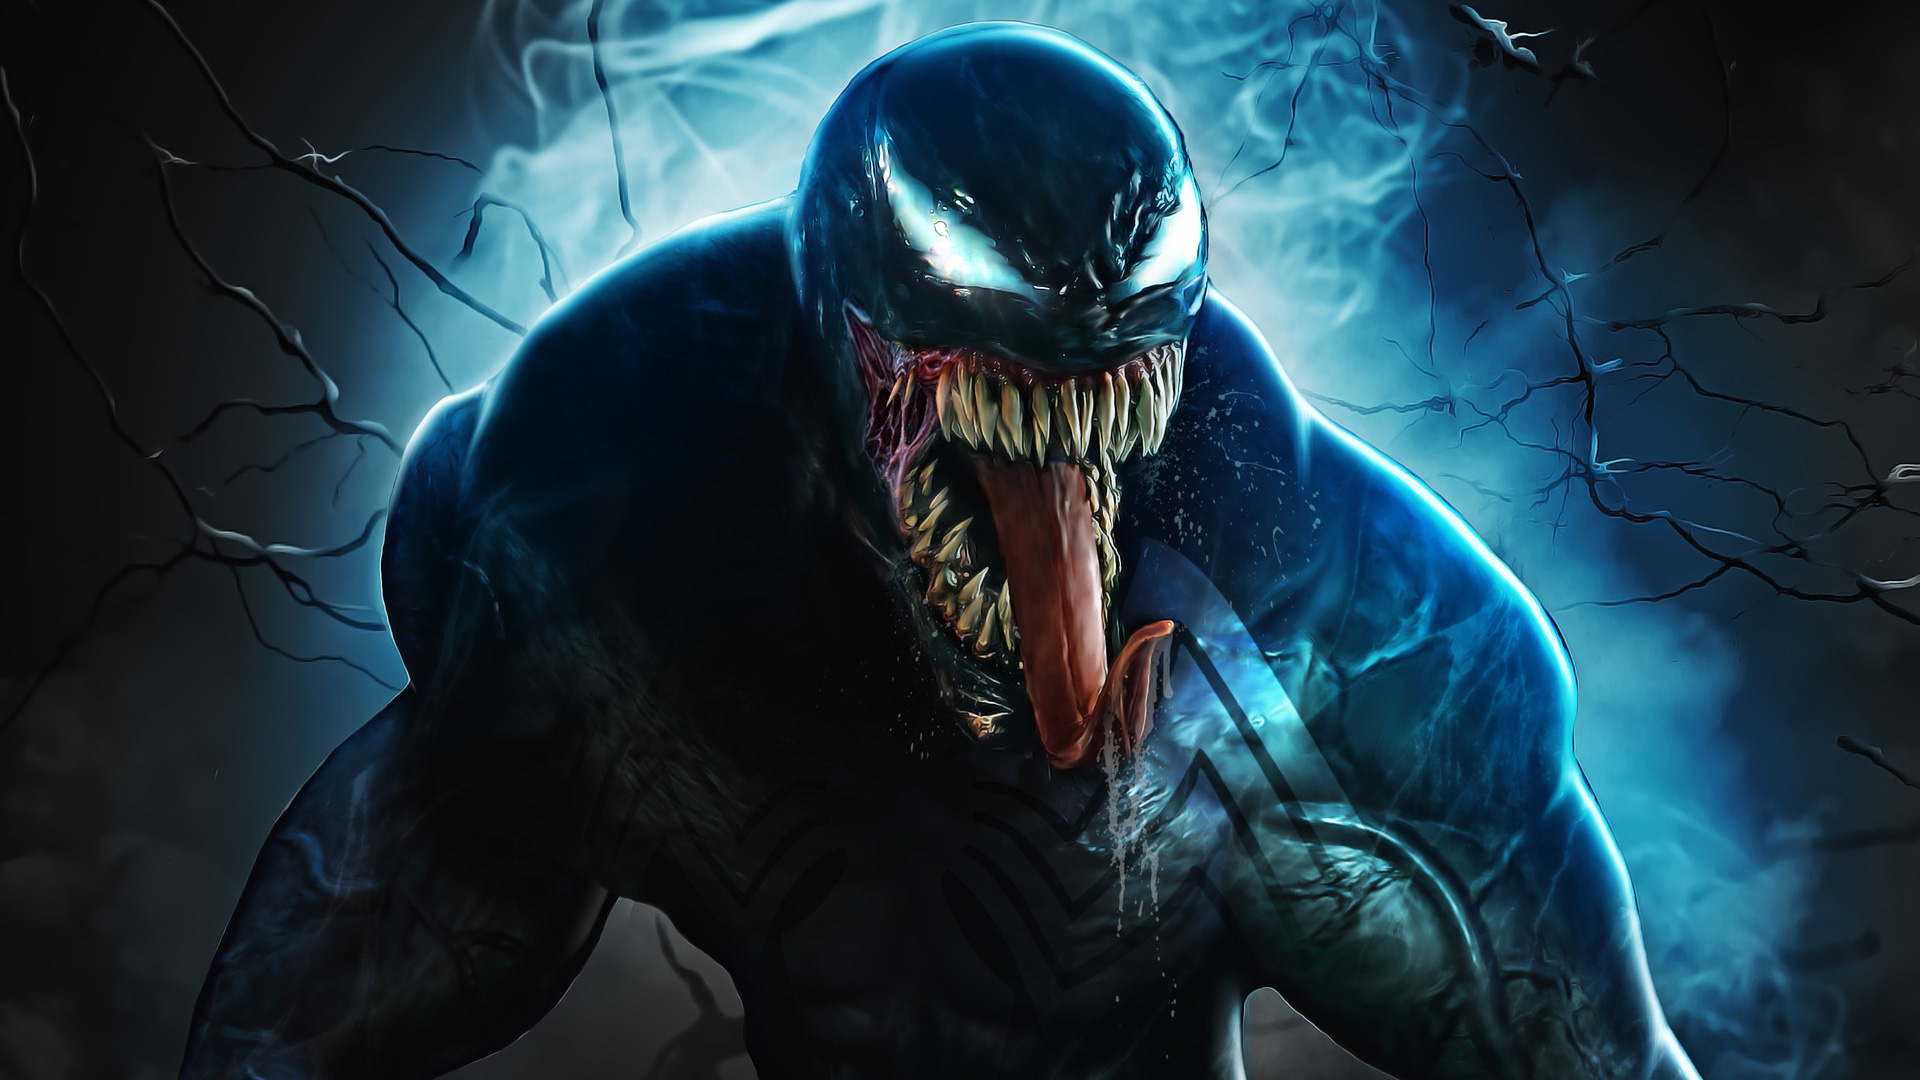 Venom Movie Fan Art, HD Movies, 4k Wallpapers, Images ...